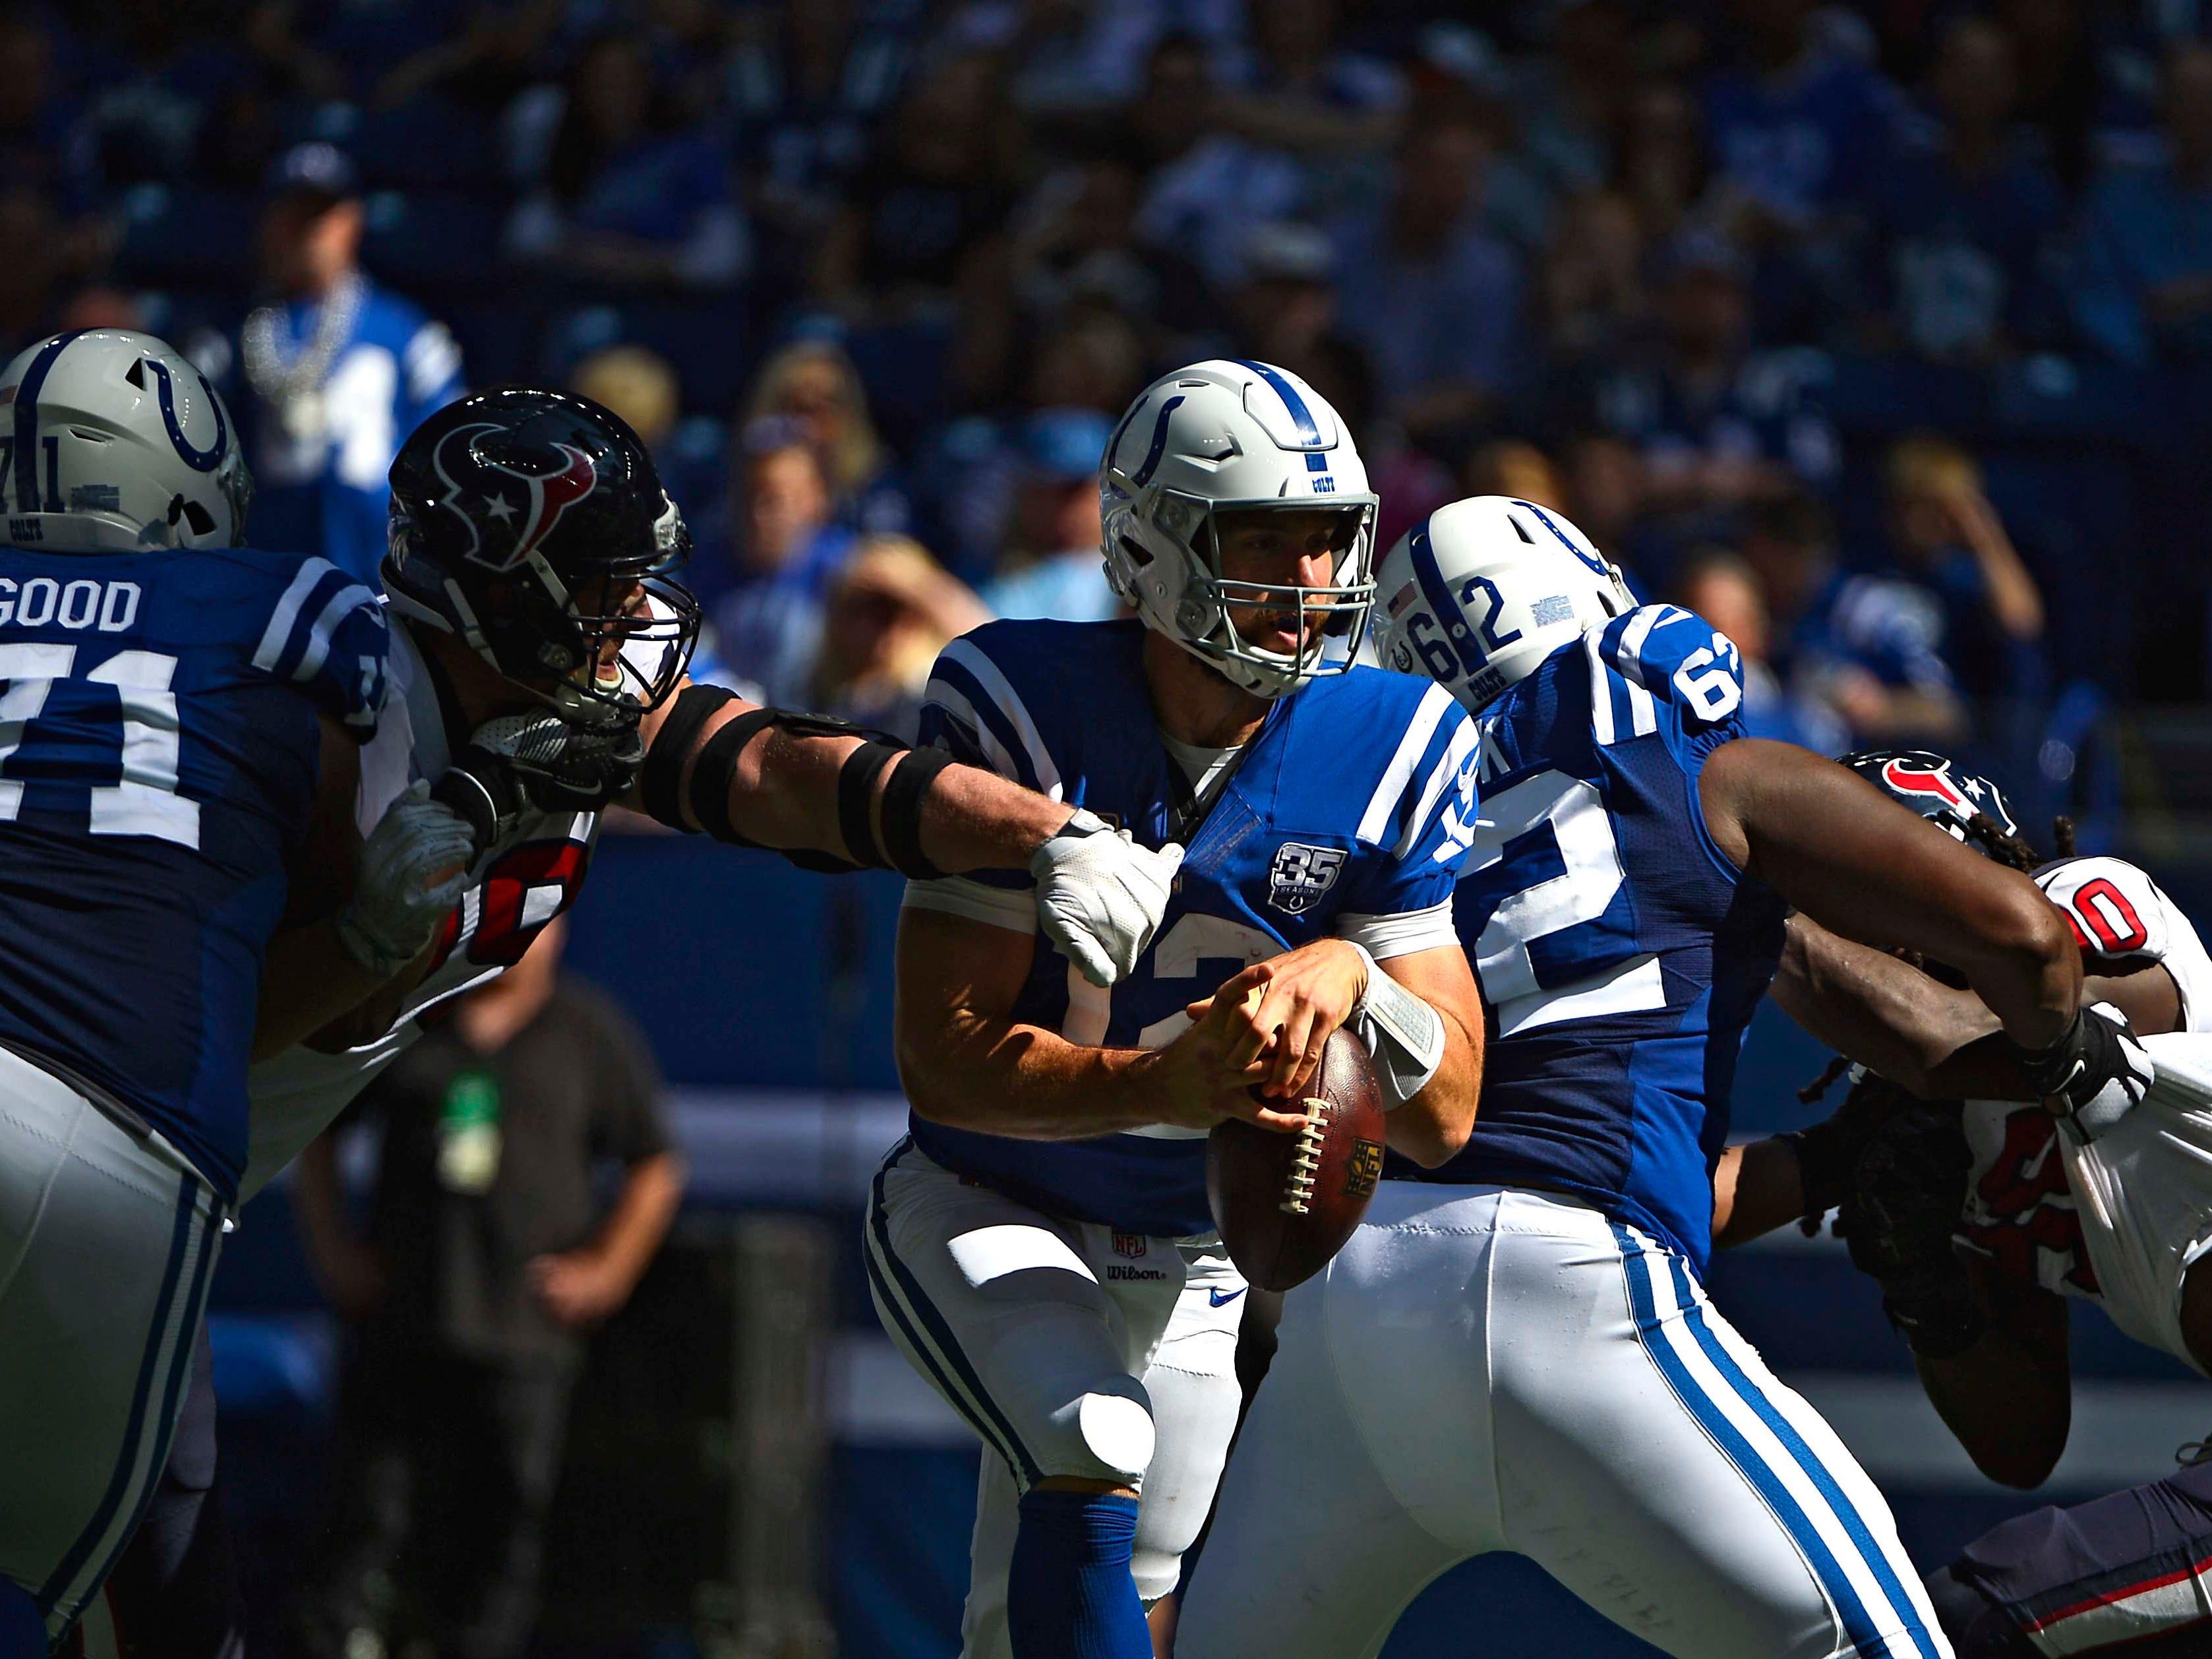 Texans defensive end J.J. Watt (99) forces a fumble by Colts quarterback Andrew Luck (12).